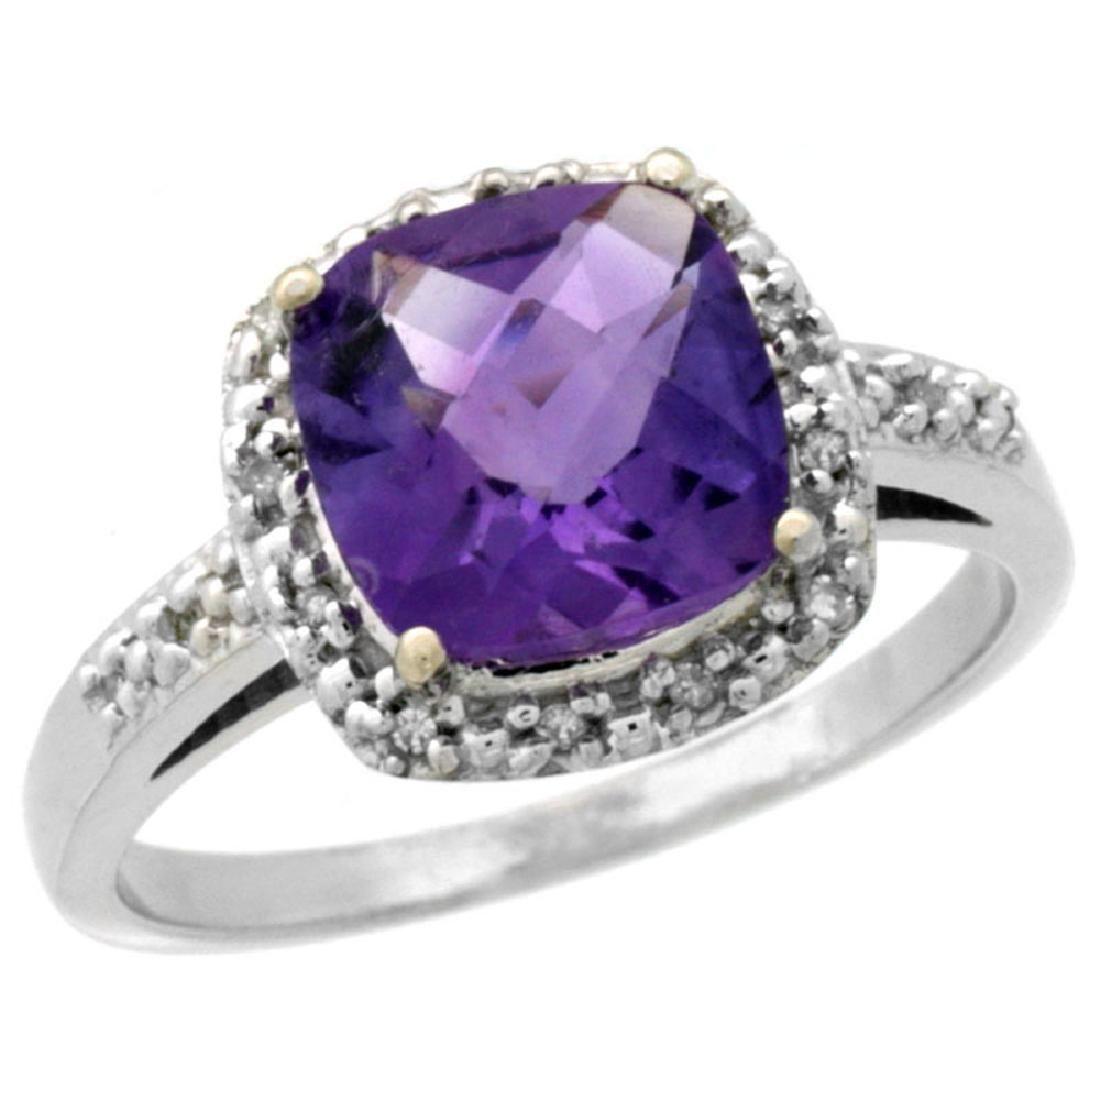 Natural 3.92 ctw Amethyst & Diamond Engagement Ring 14K